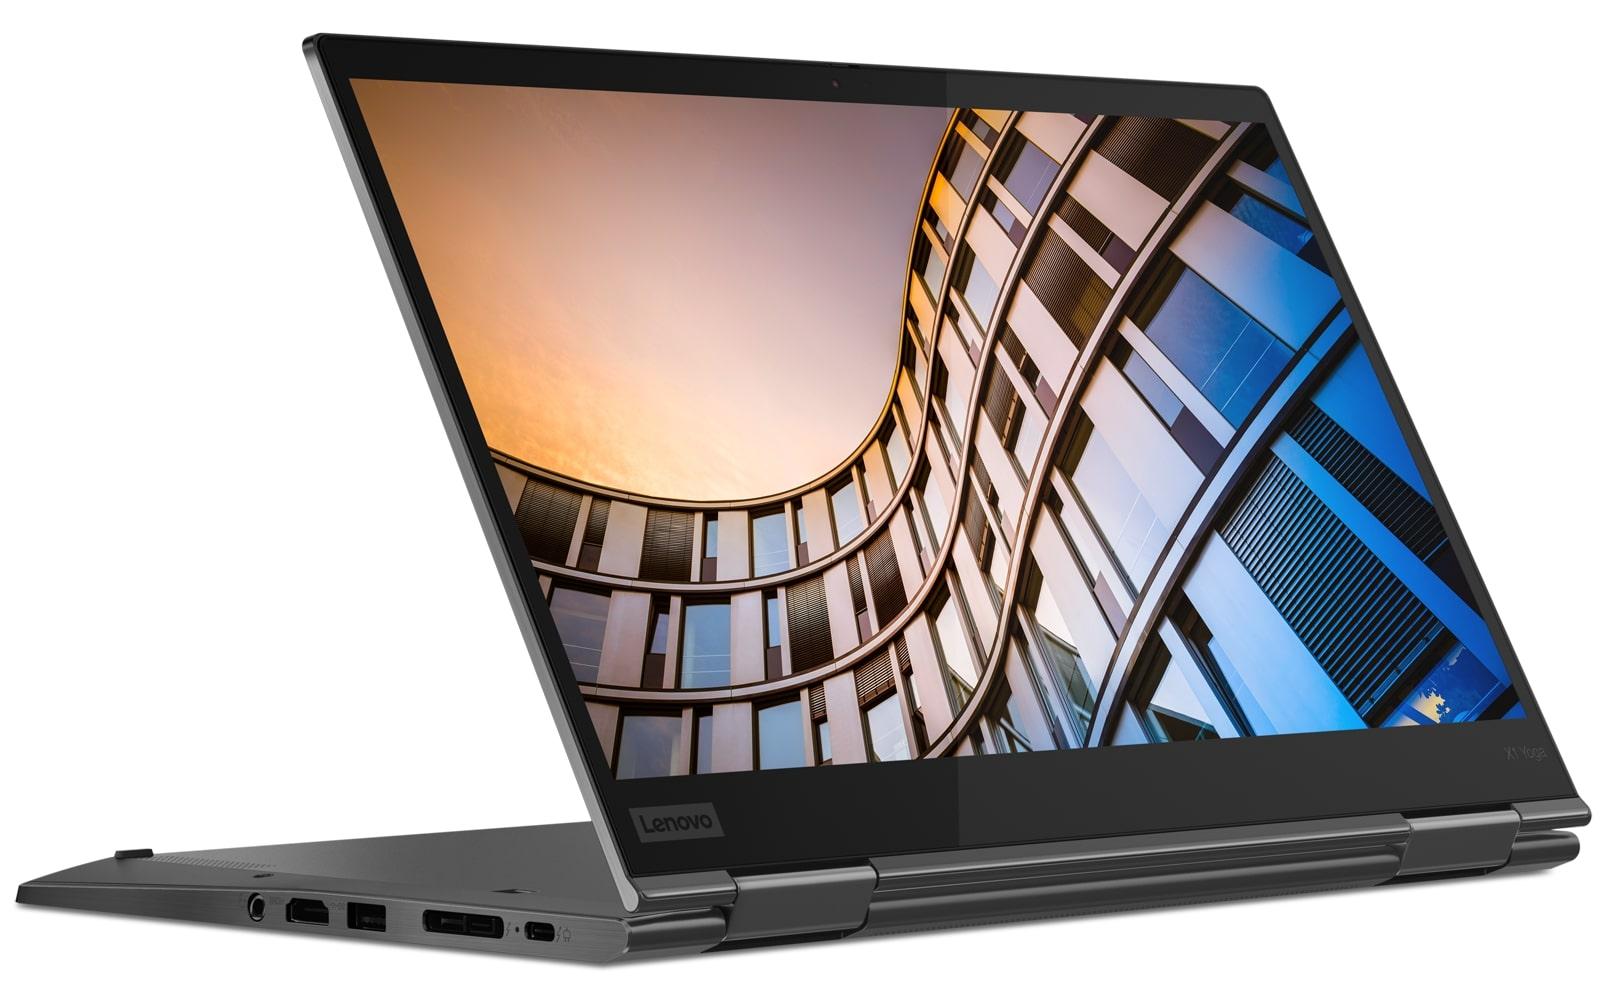 TP X1 Yoga 4 14UHD/i7-8565U/16G/512/LTE/W10P